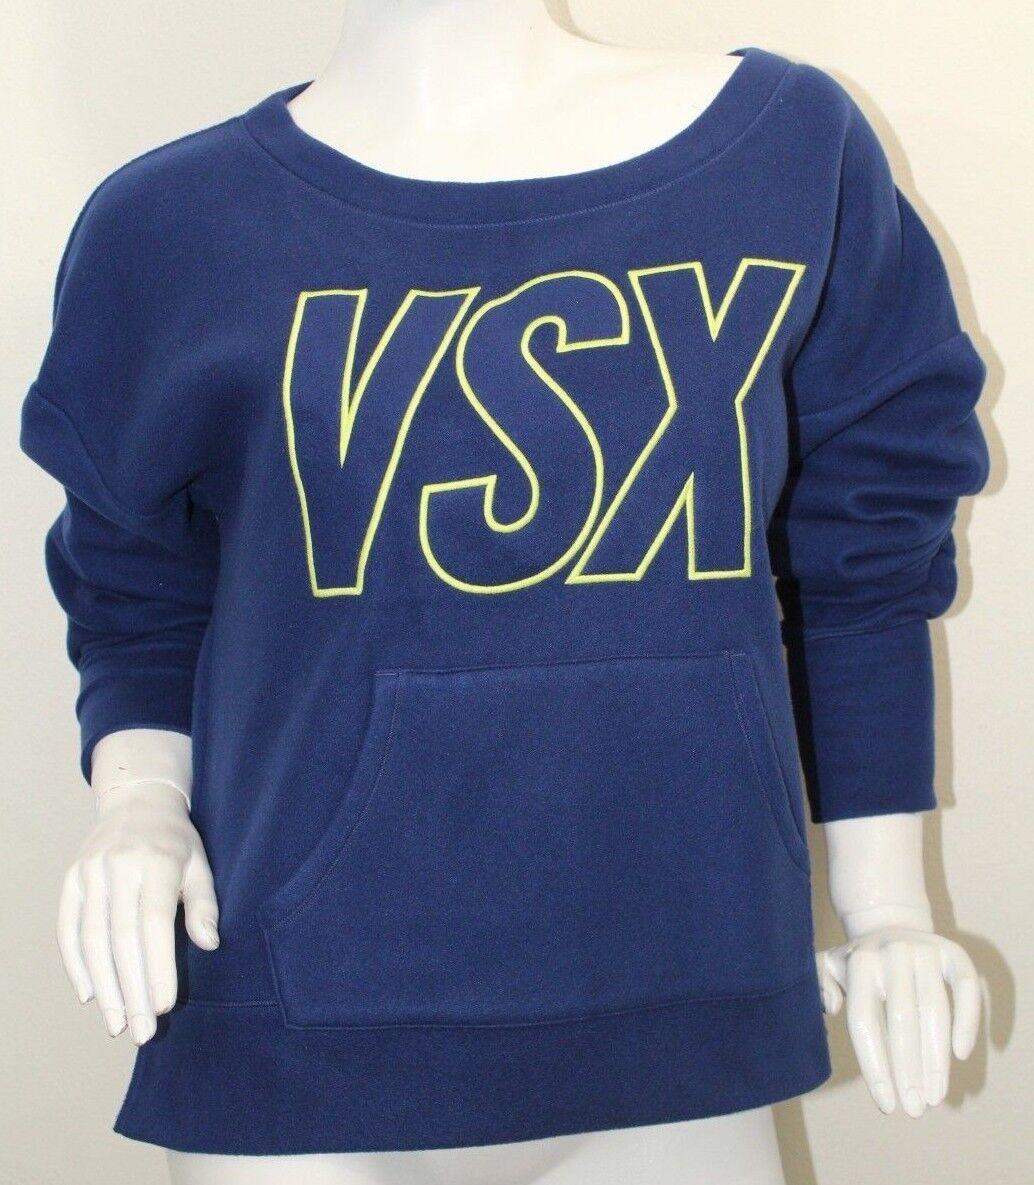 Victoria's Secret VXS Sport Soft Fleece Sweatshirt Blau Sz XS,S,Med,Large NWT